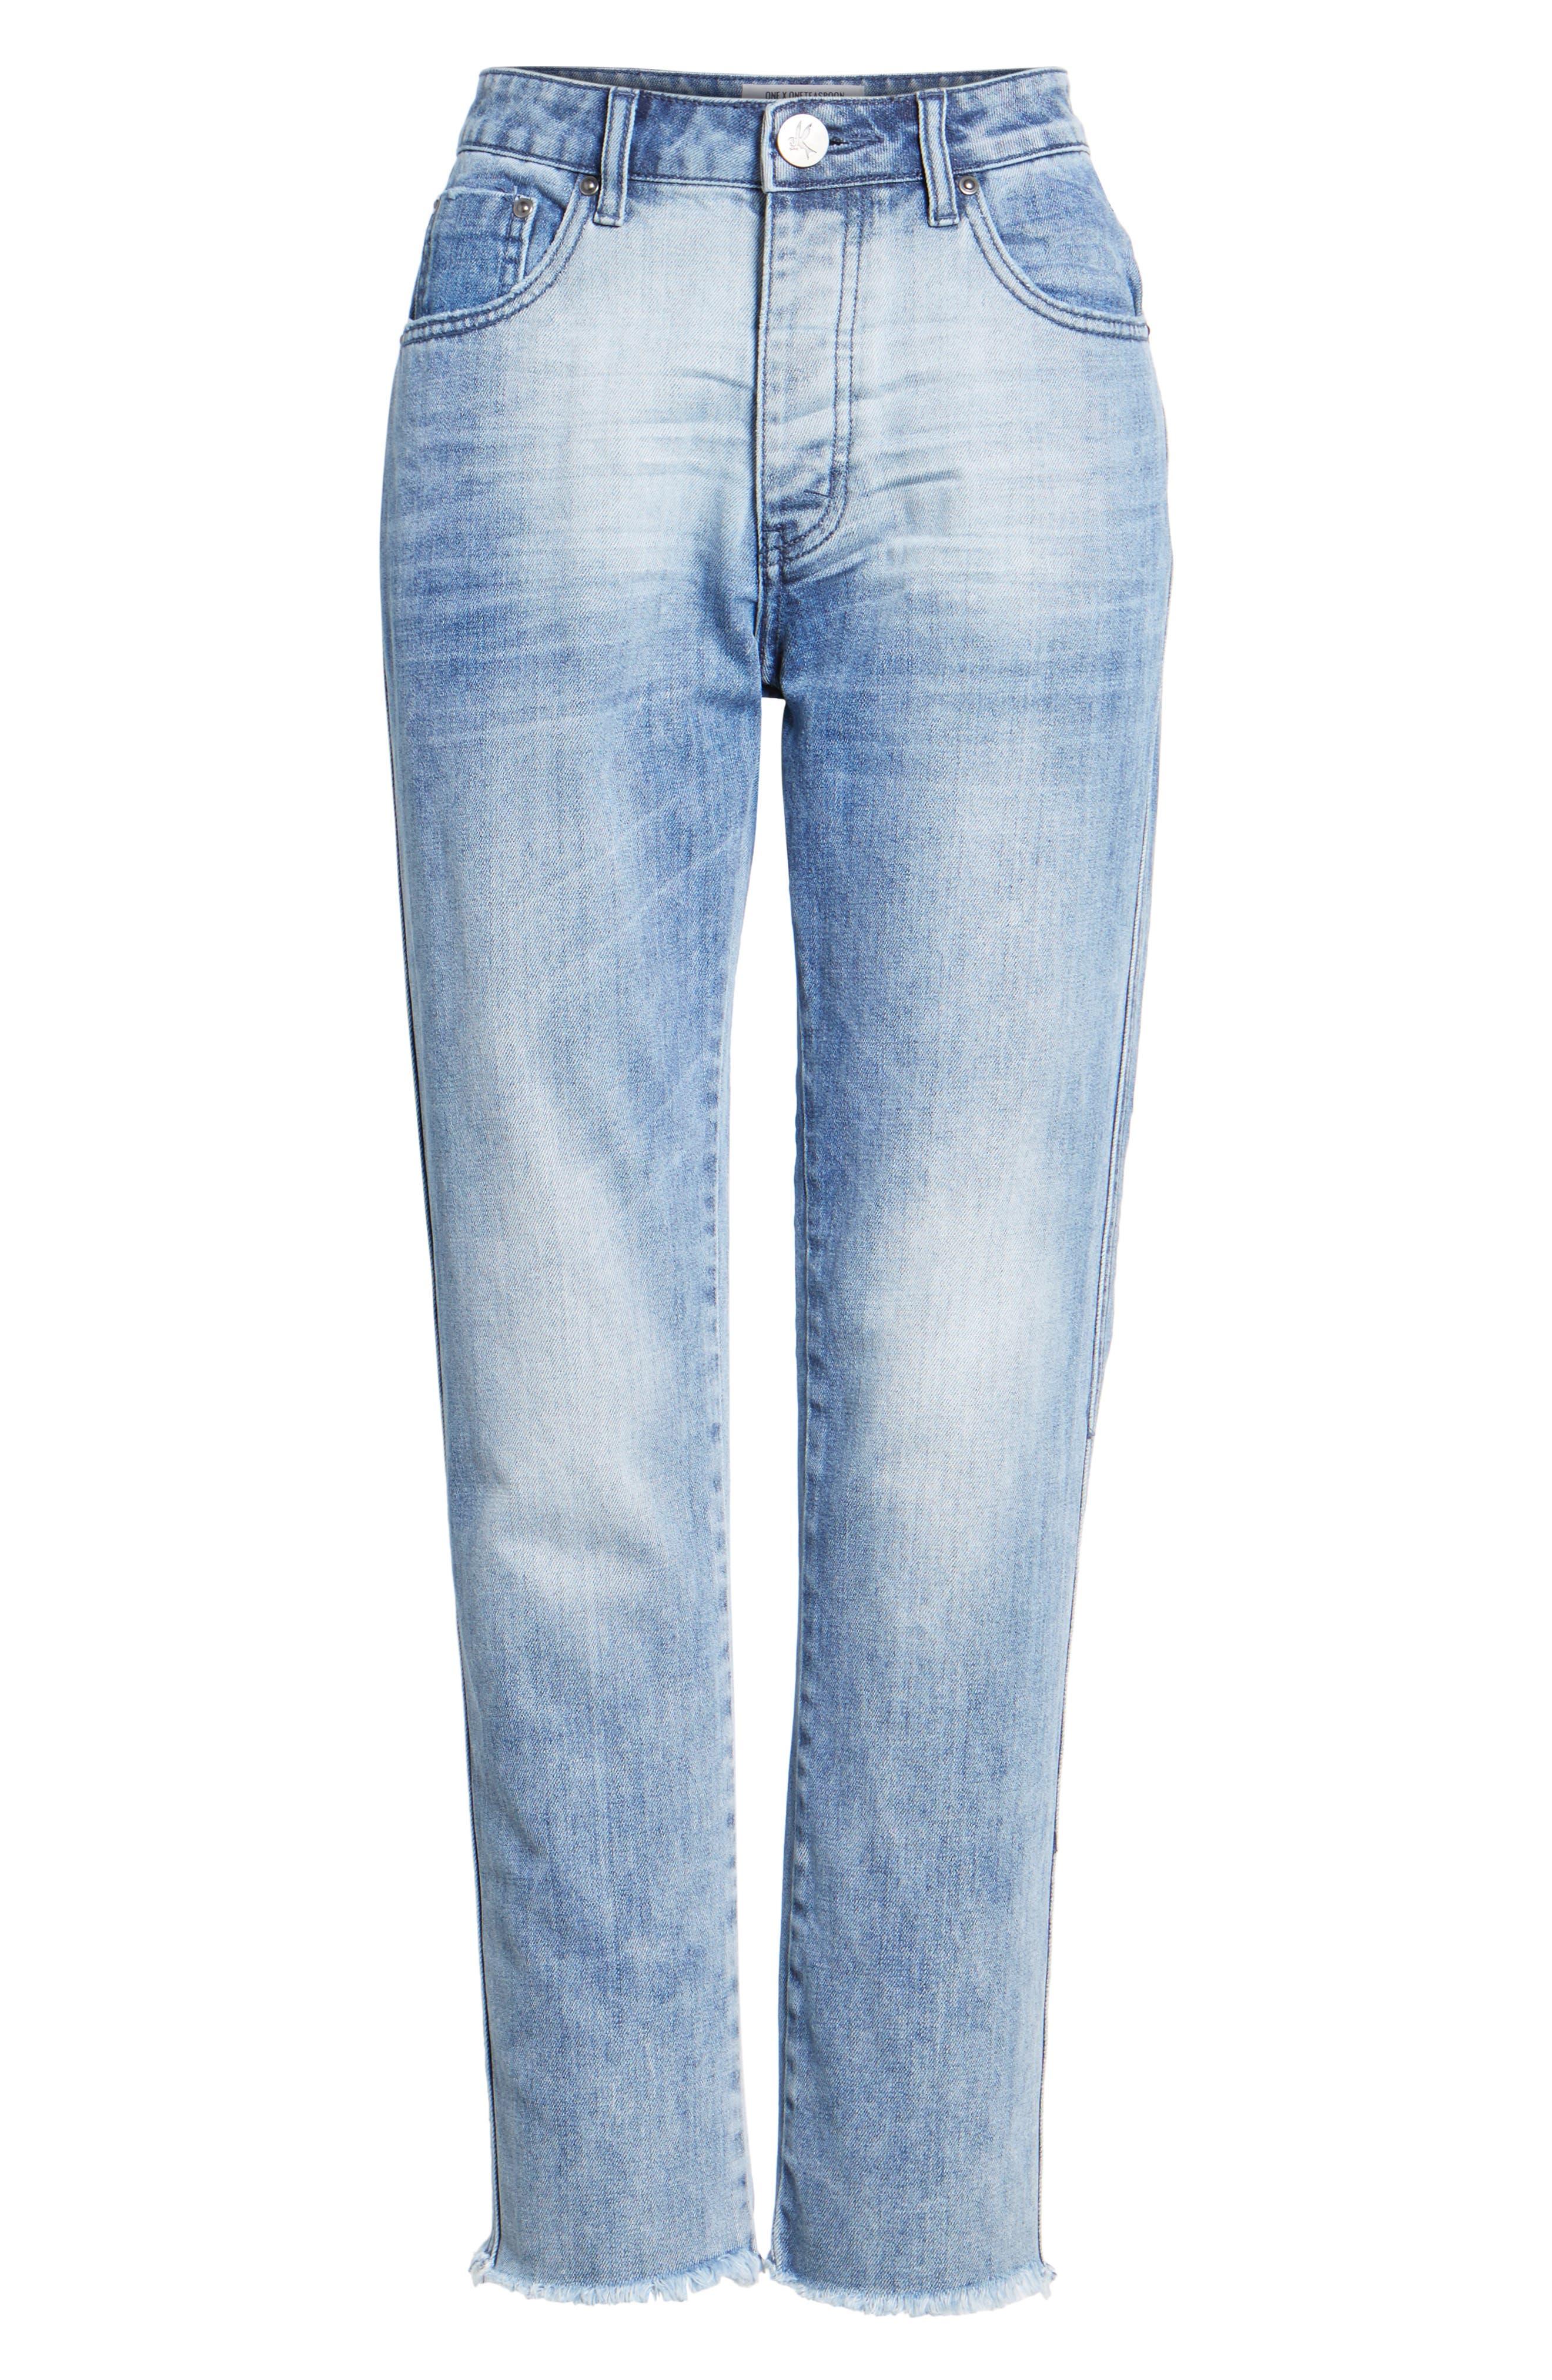 Tuckers High Waist Straight Leg Jeans,                             Alternate thumbnail 6, color,